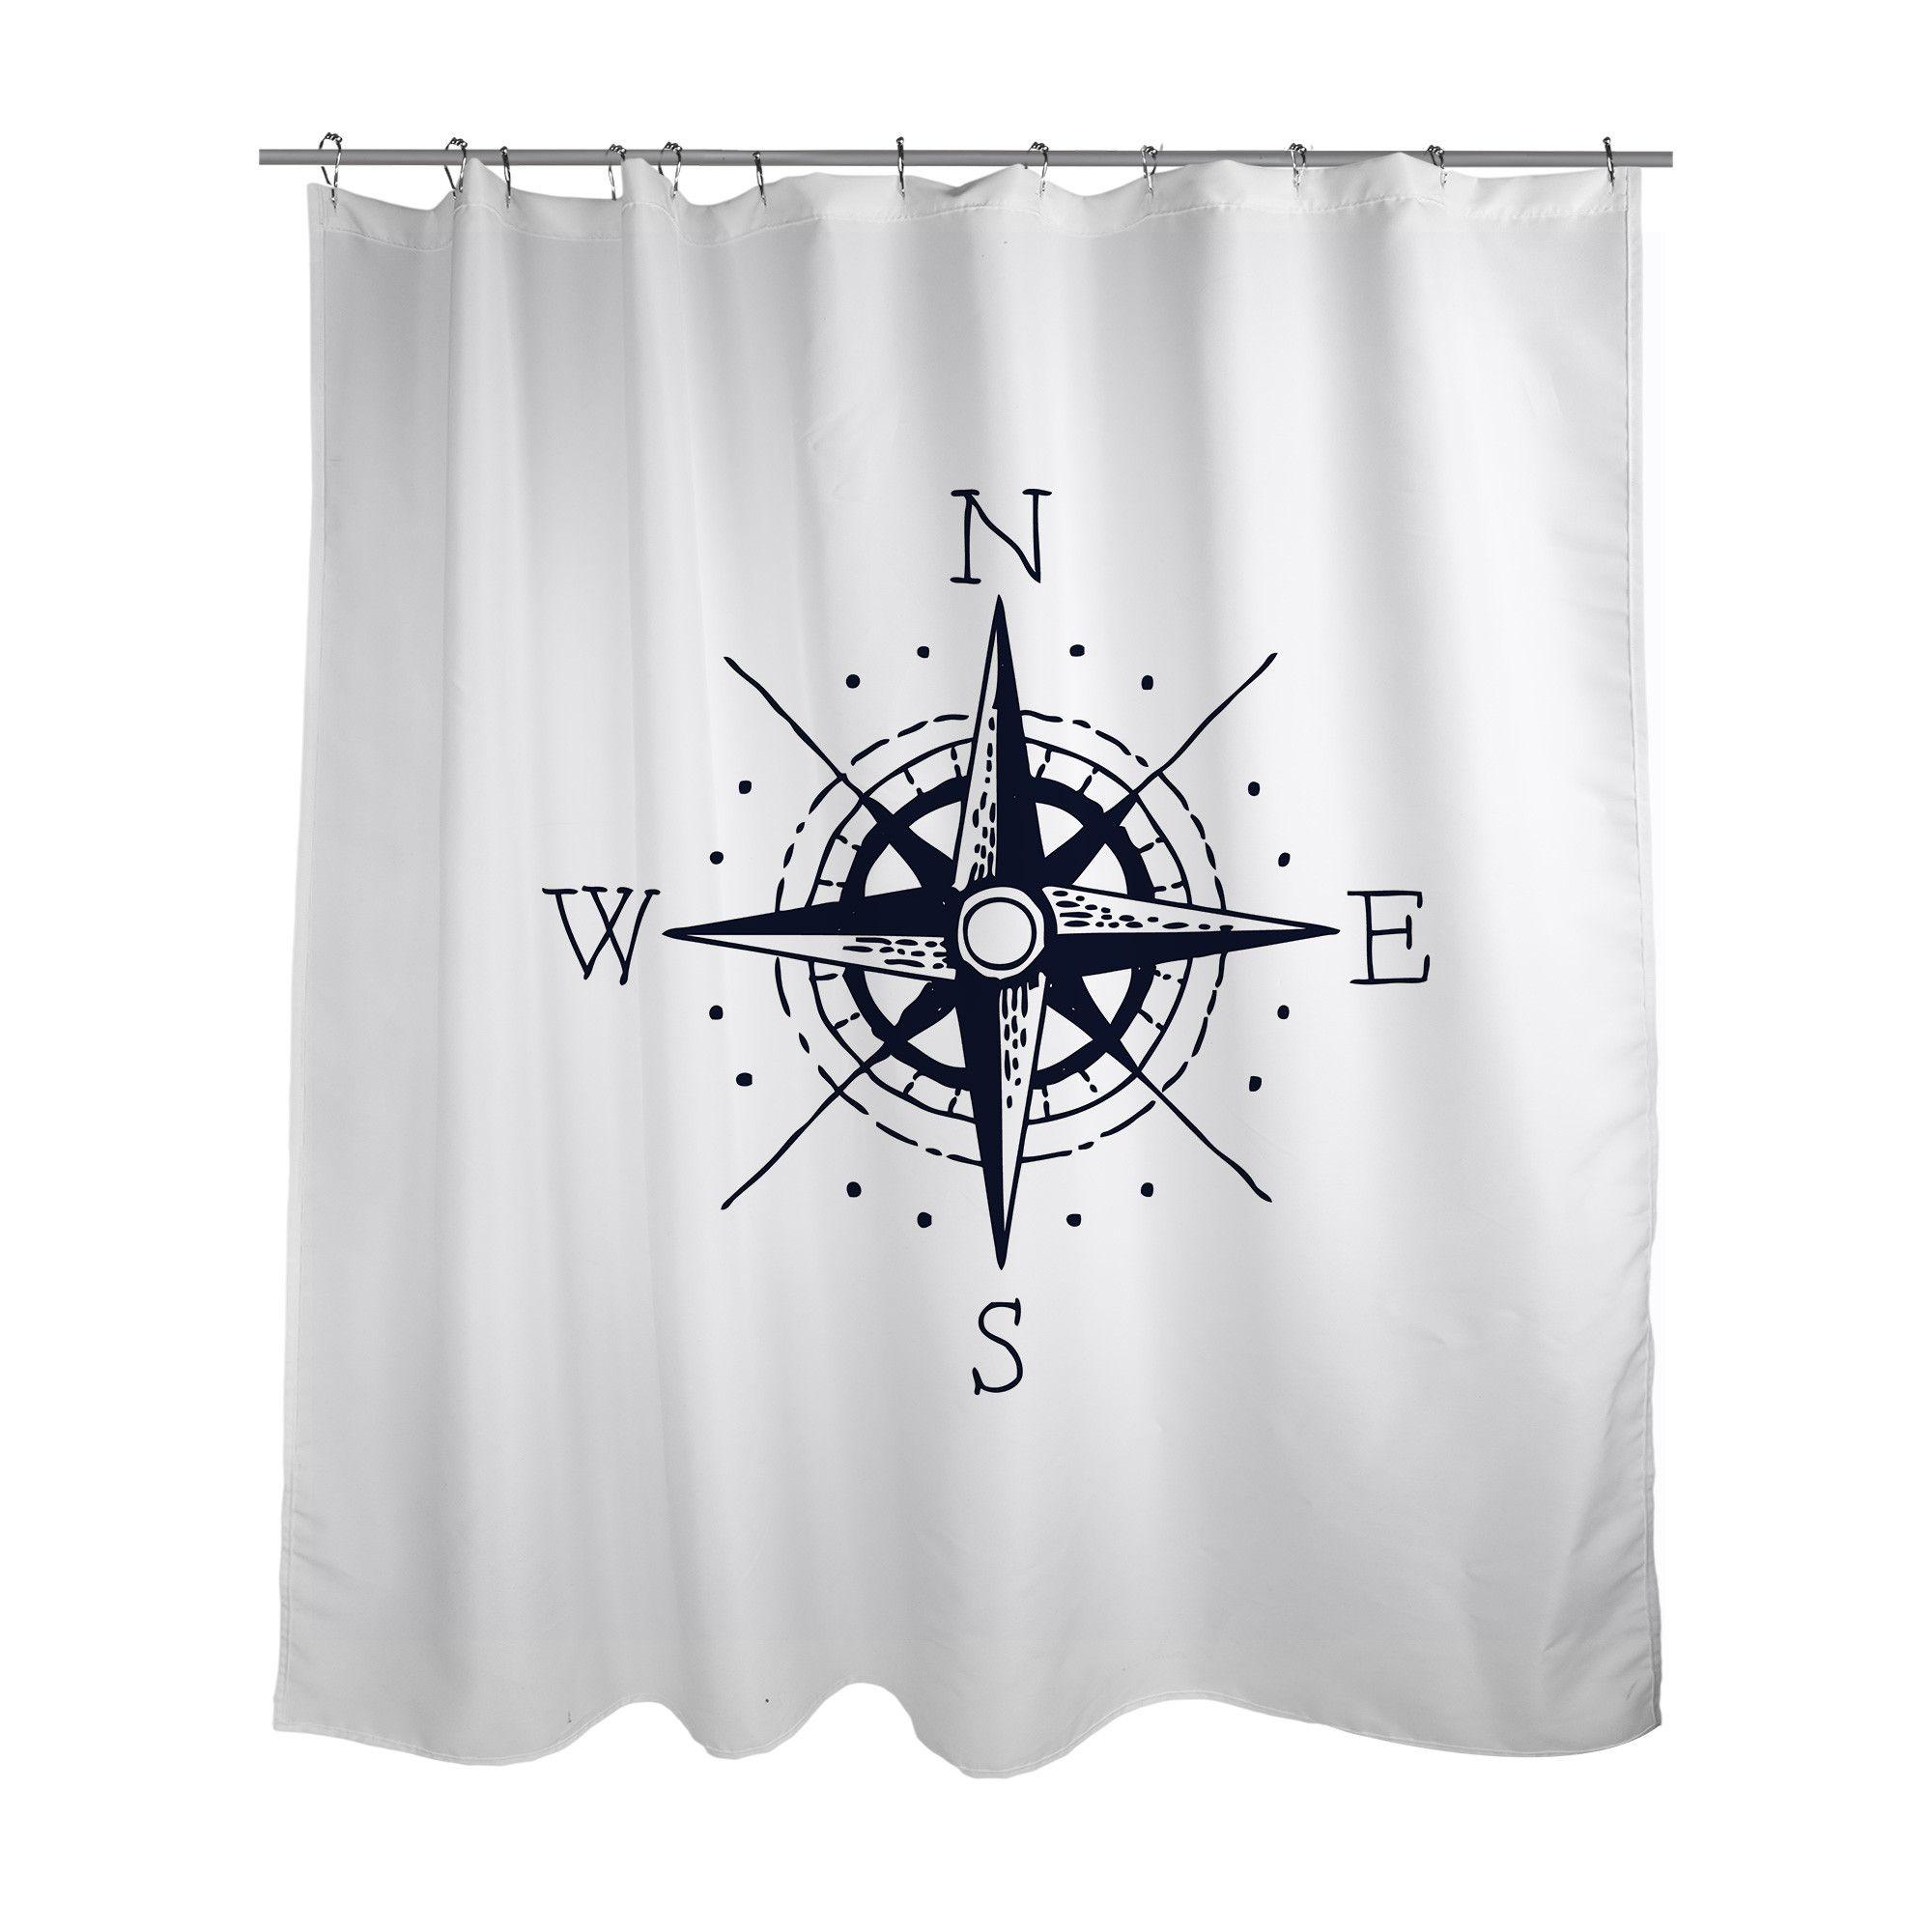 pin josh curtain pinterest s nautical compass curtains room shower